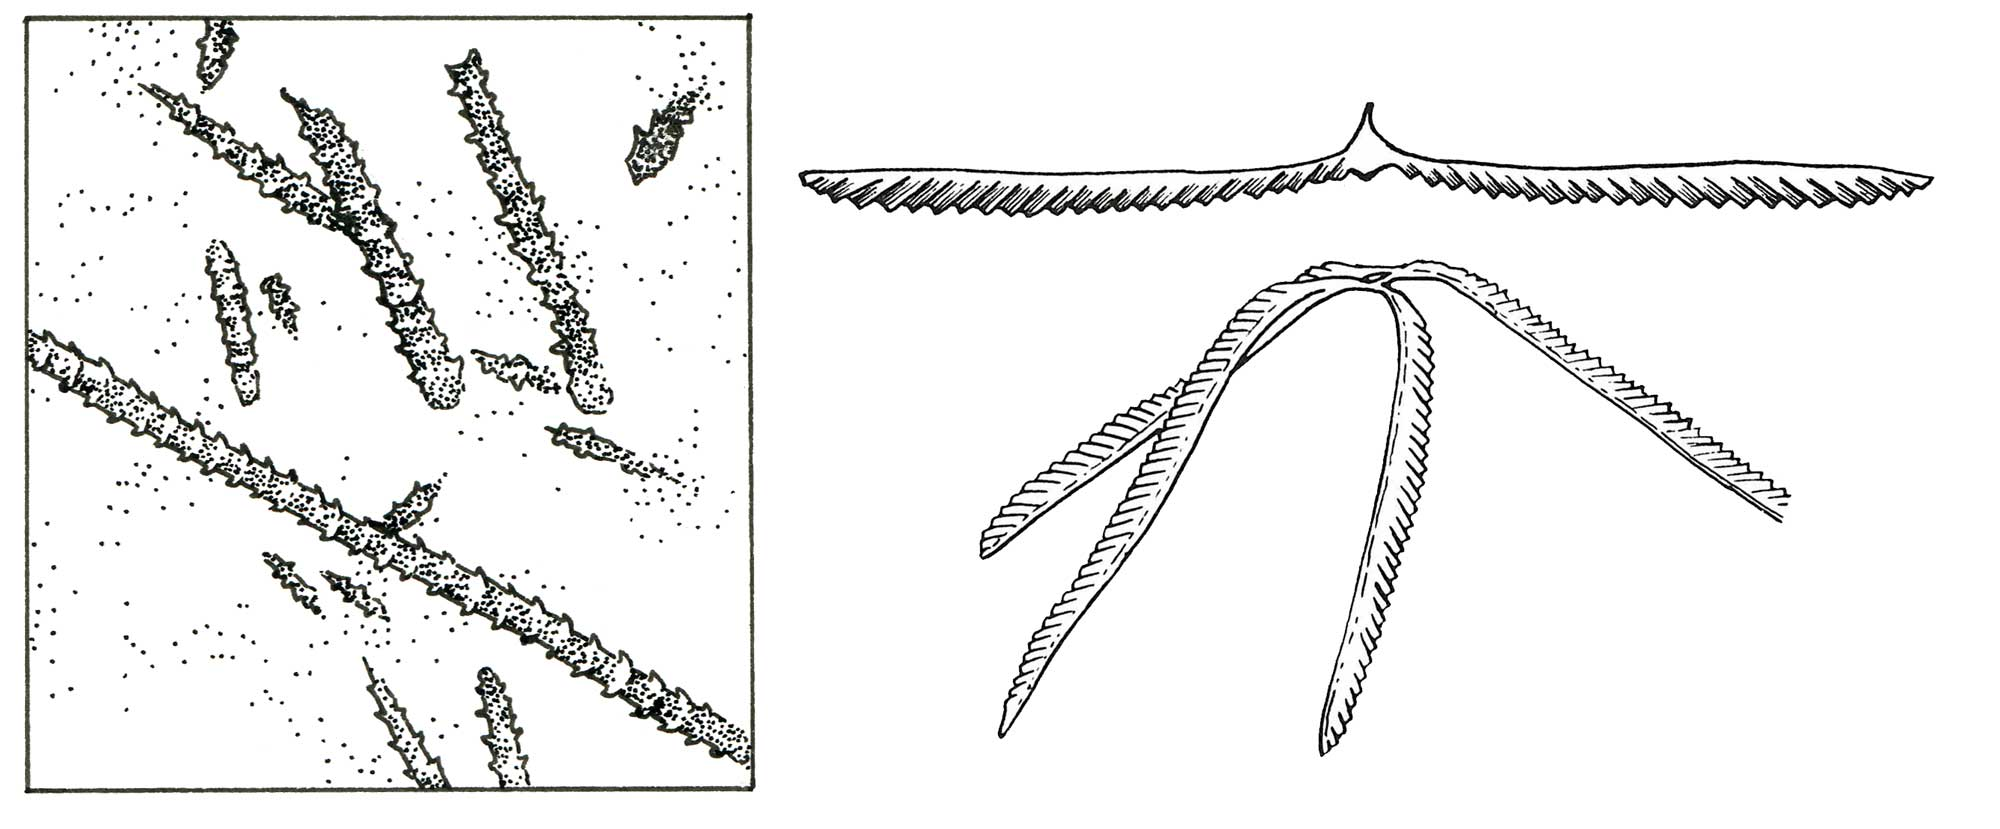 Drawings of graptolites.